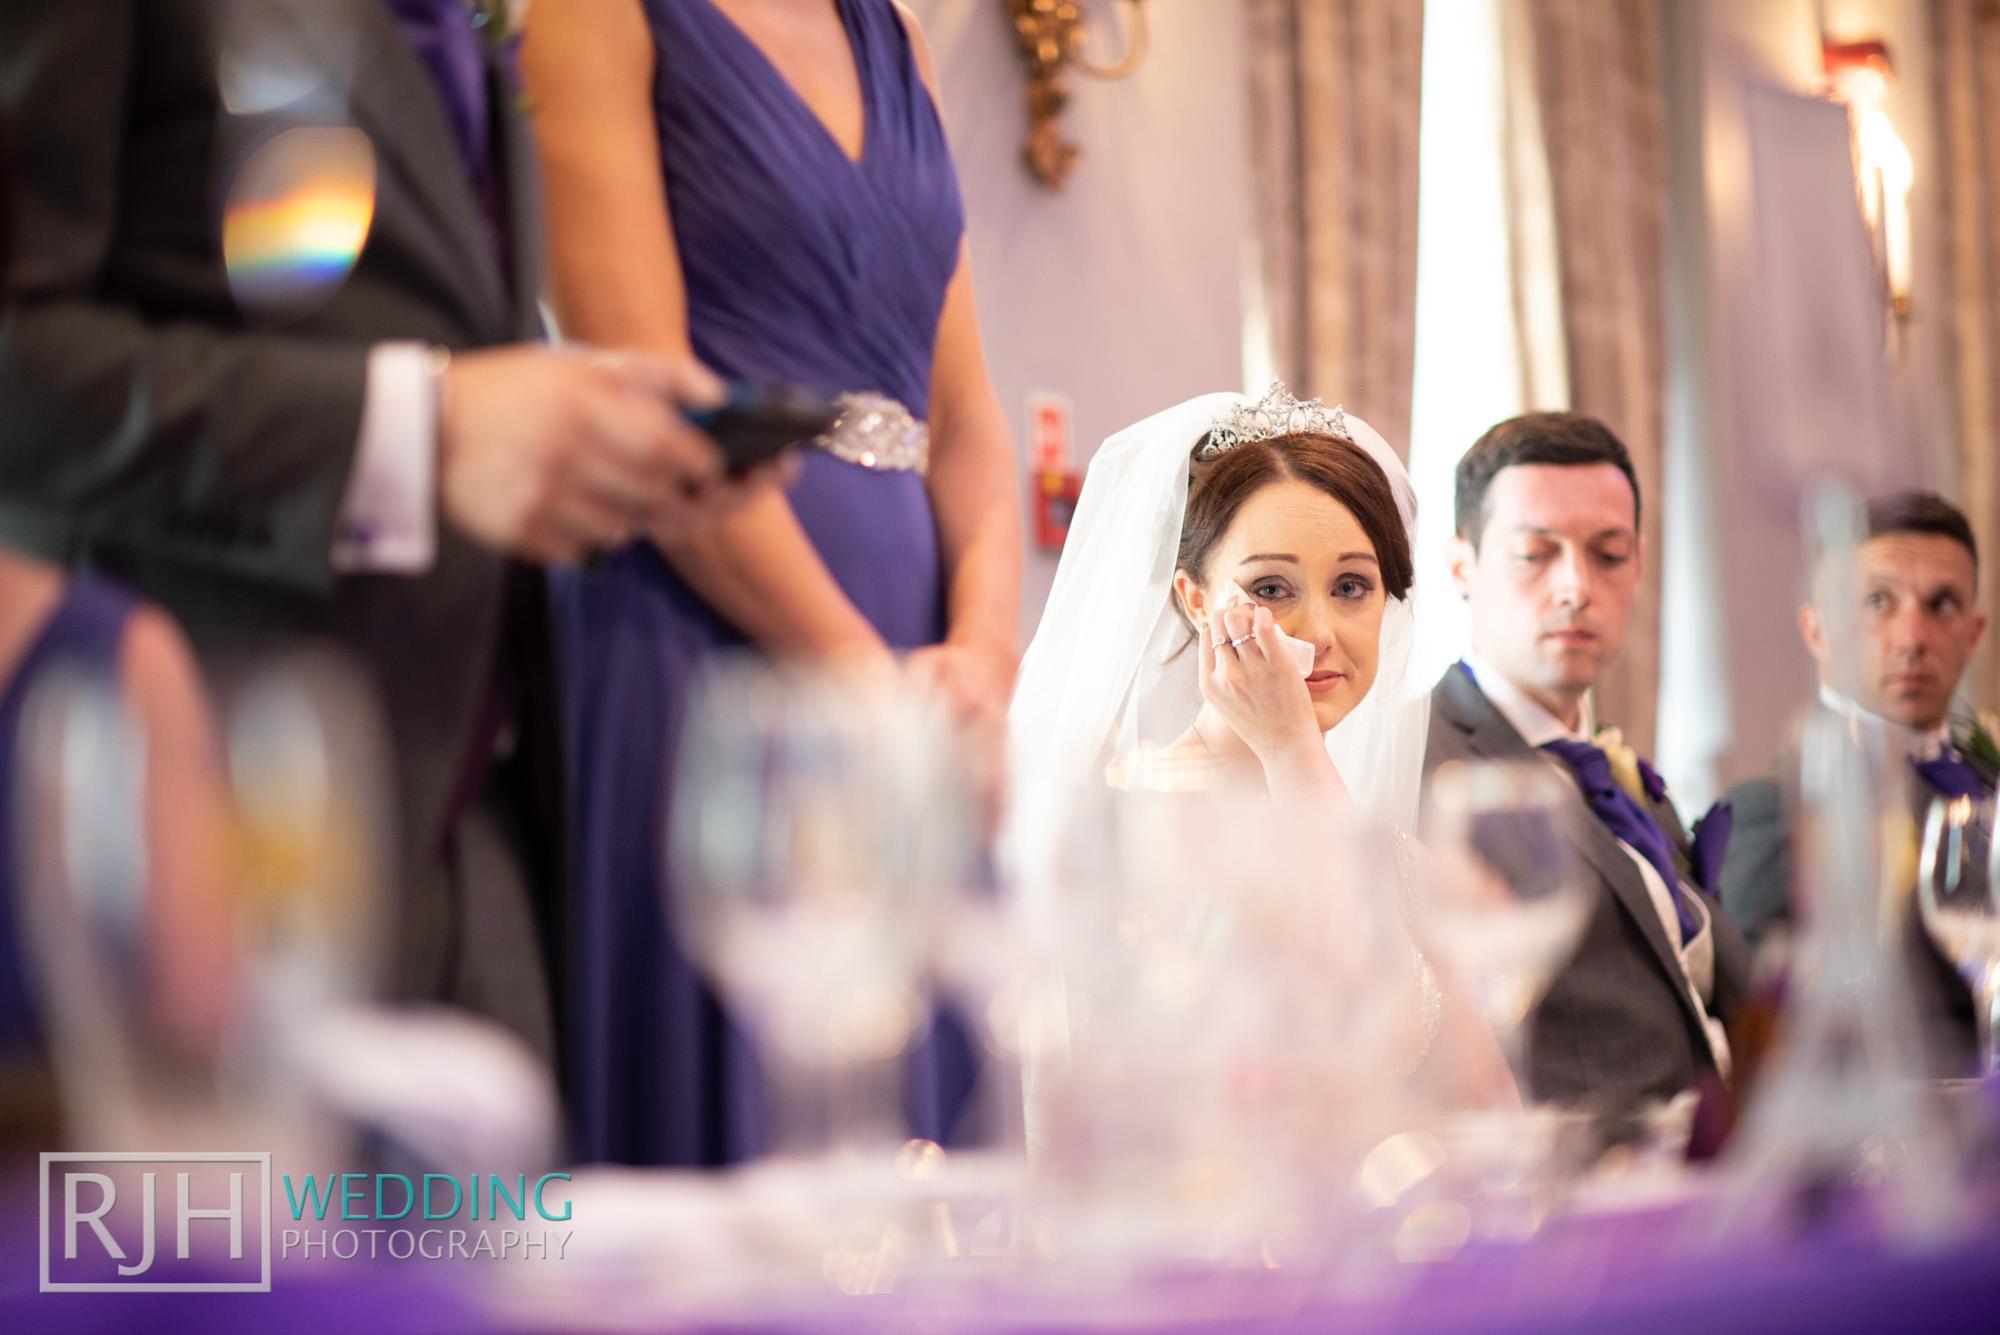 Oulton Hall Wedding Photography_Goodwill-Hall_038_DSC_3912.jpg